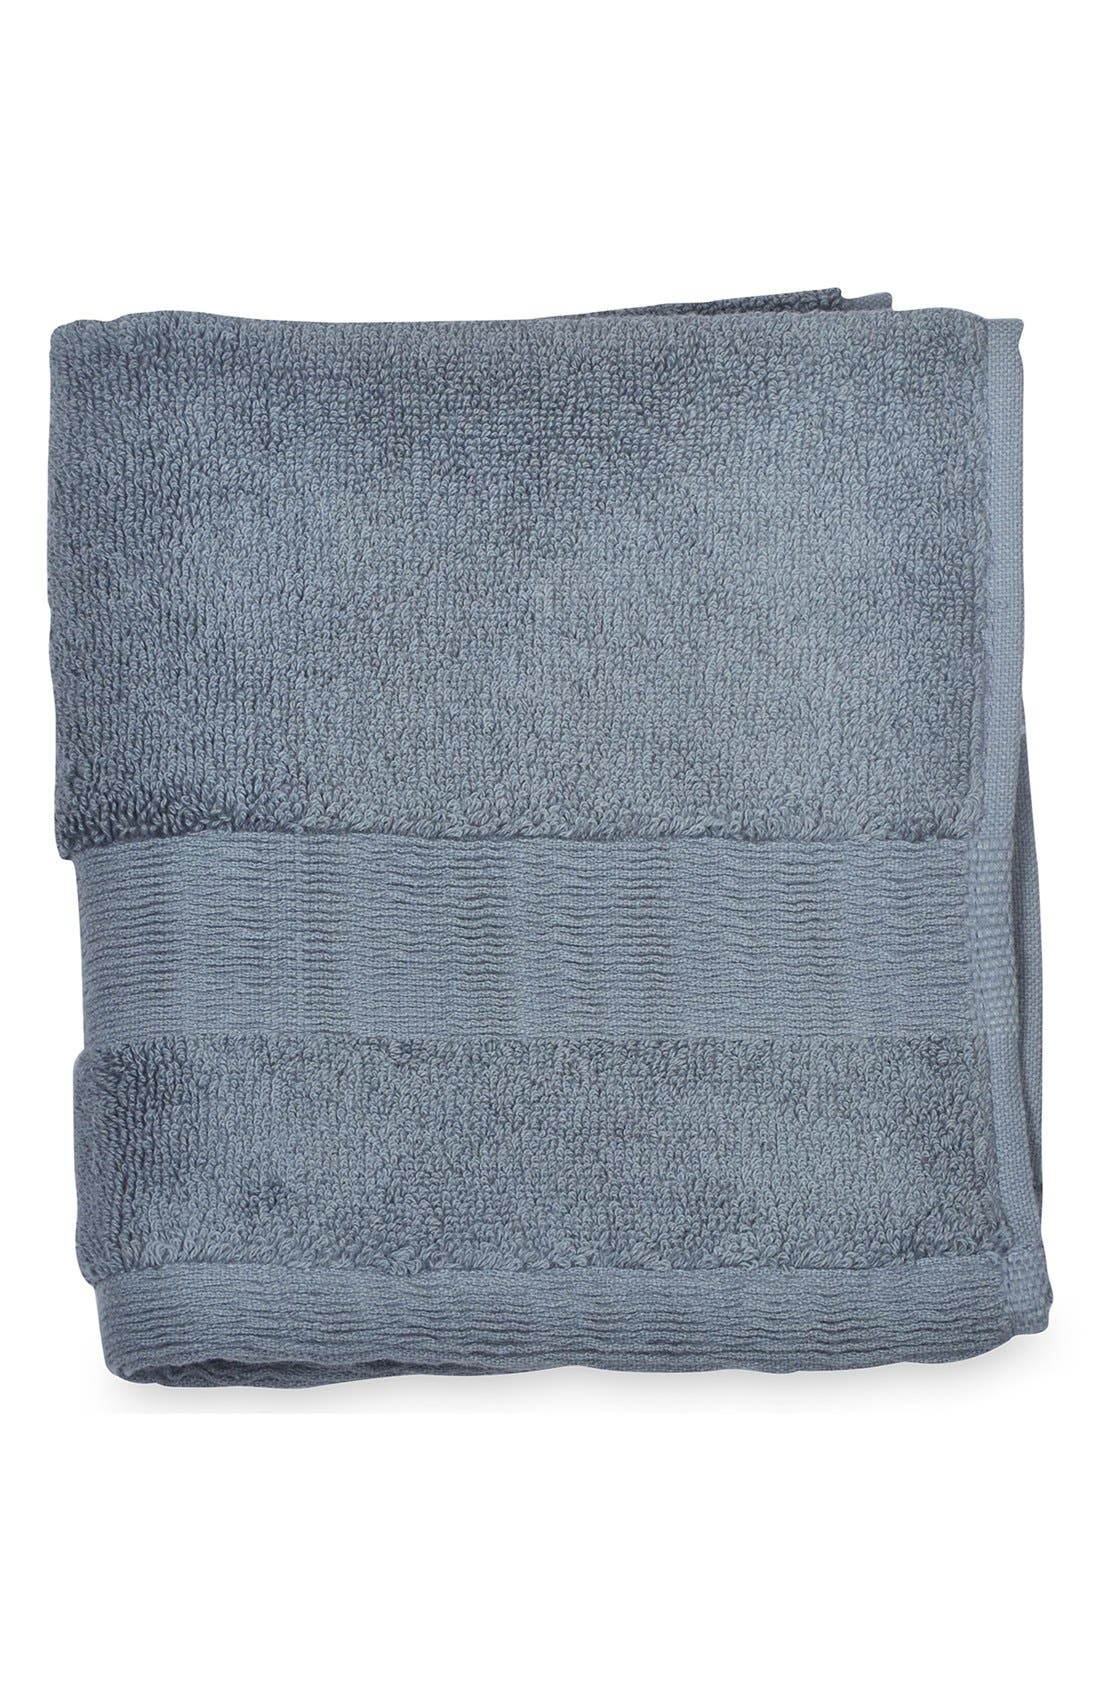 DKNY Mercer Wash Towel